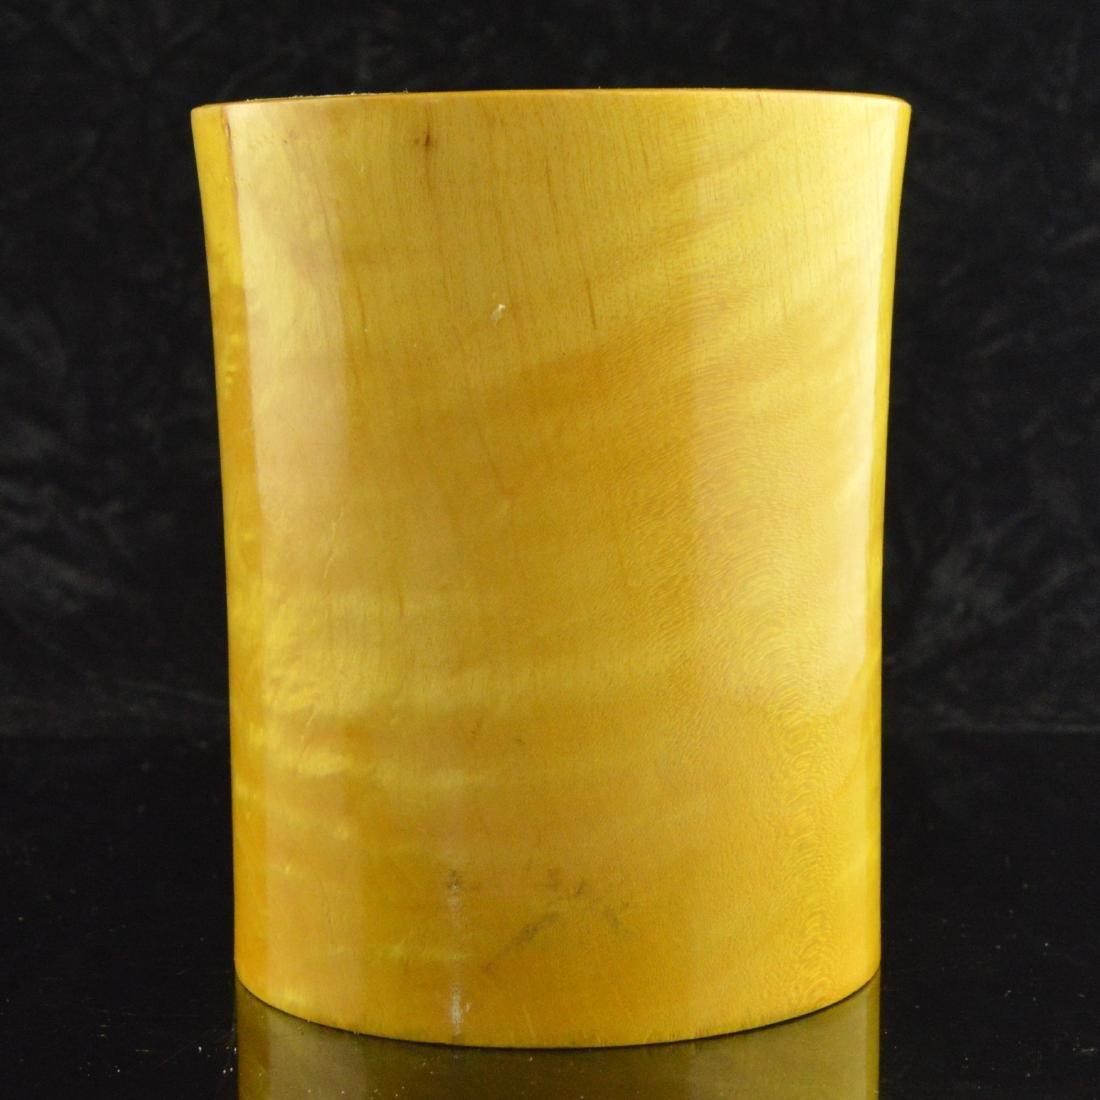 Penholder & Cloisonne Vase Pair - 4